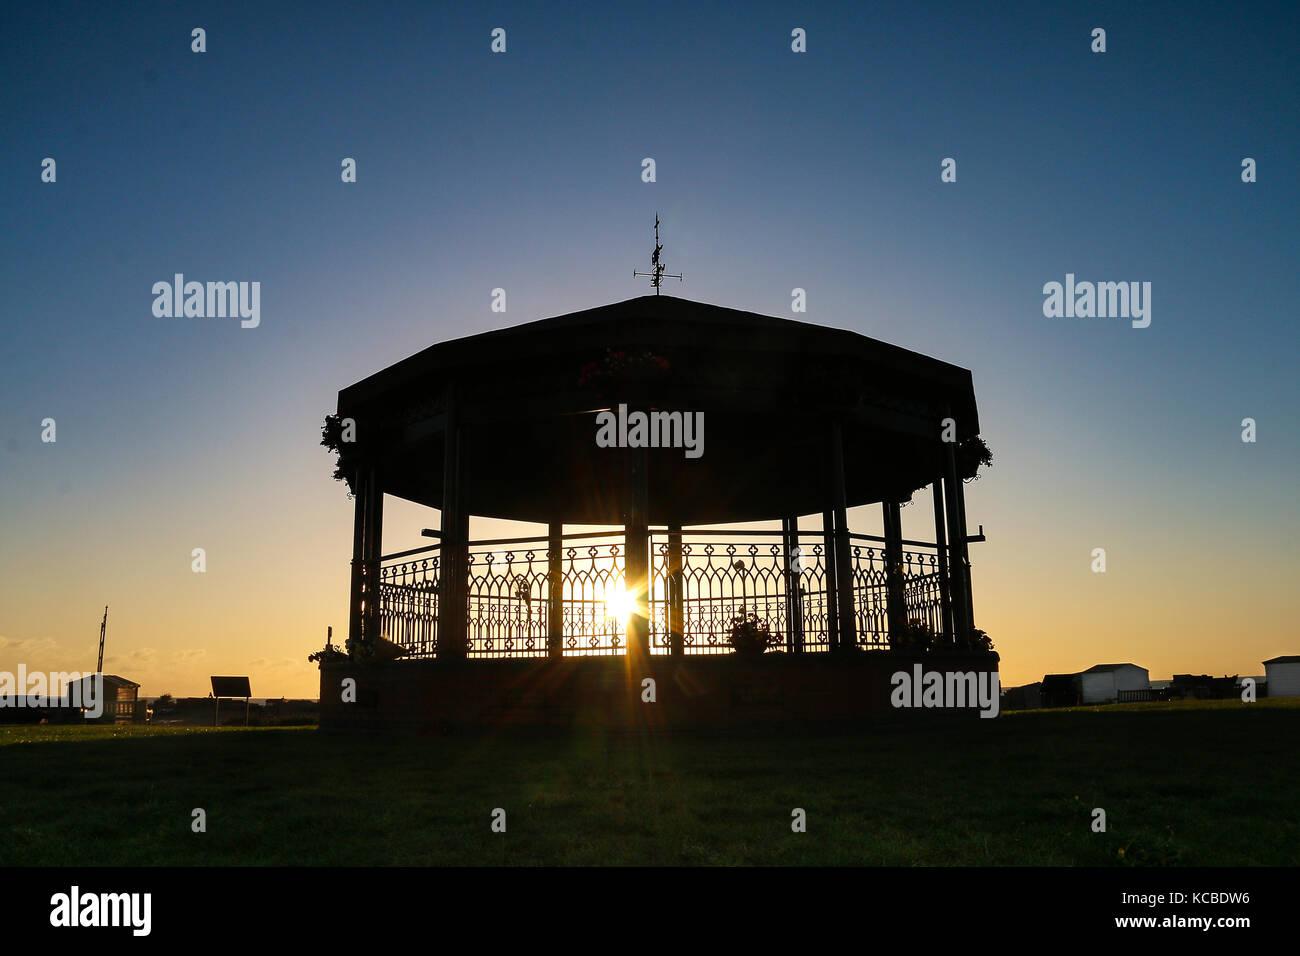 Walmer Memorial Bandstand - Dawn - Stock Image